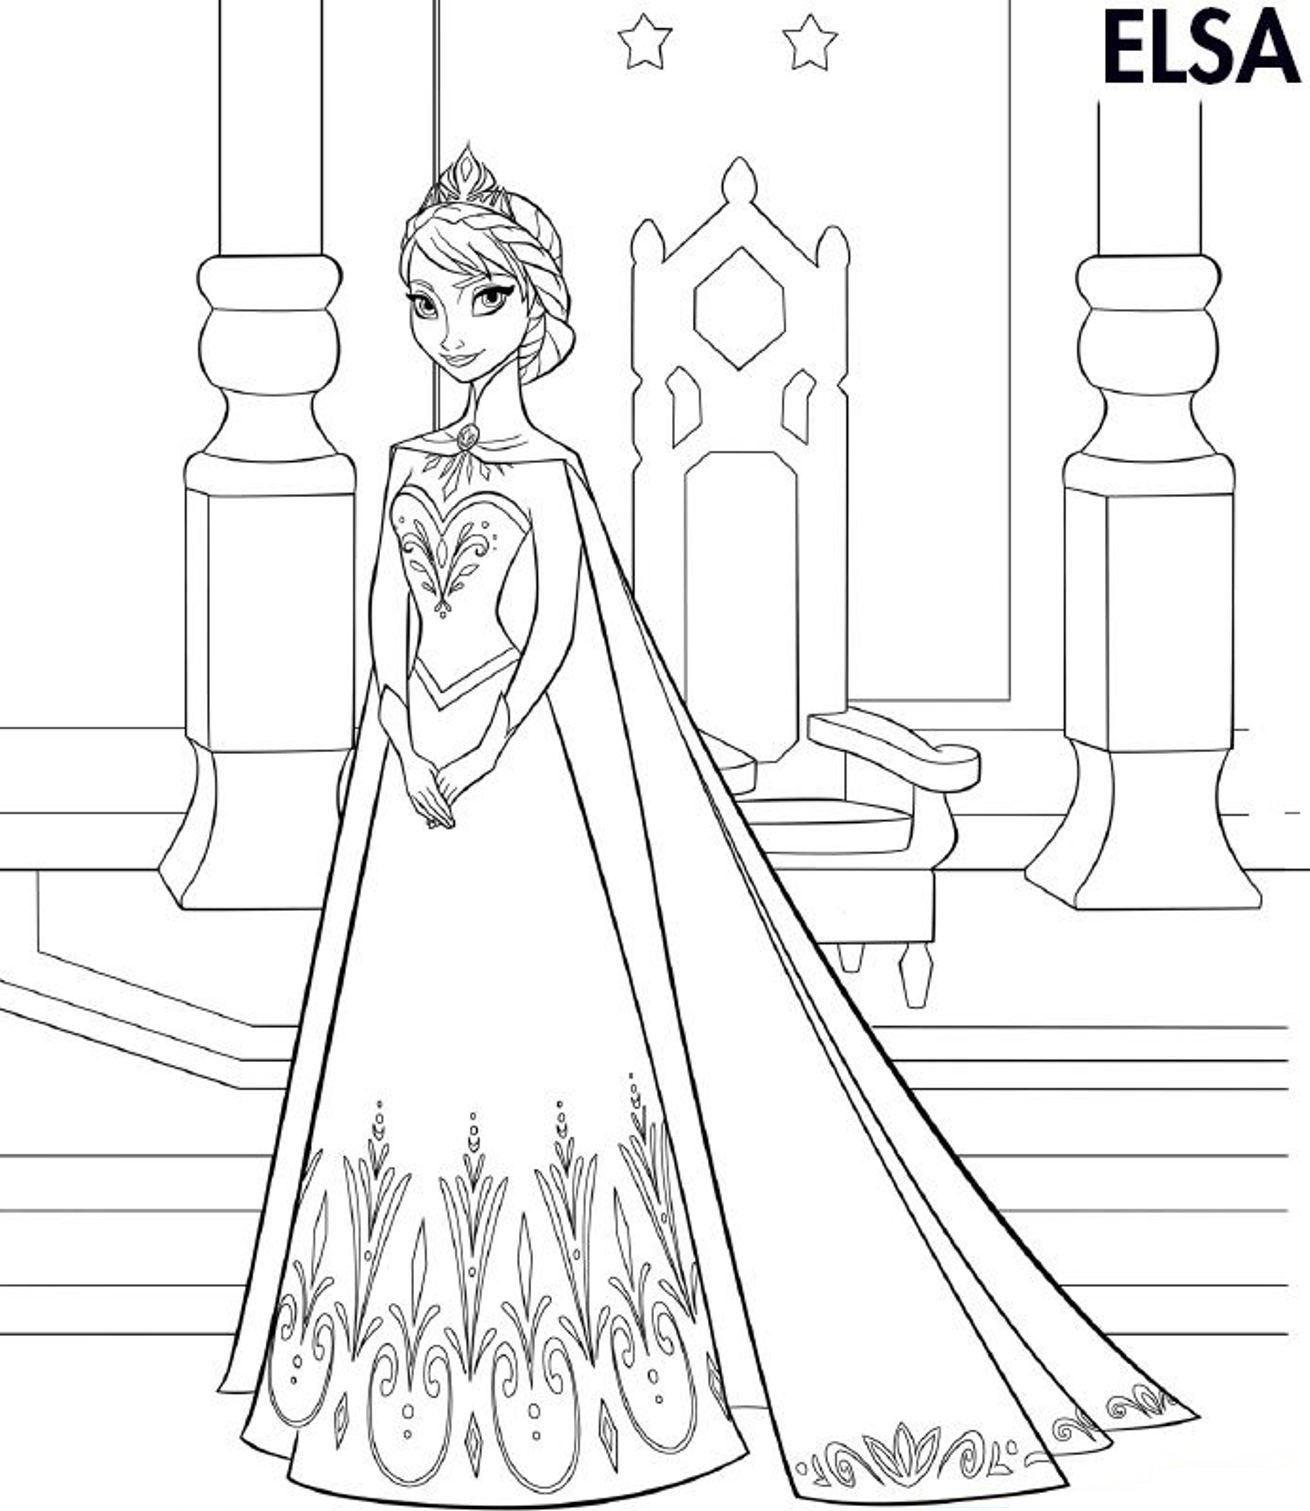 Elsa Frozen Coloring Page Printable